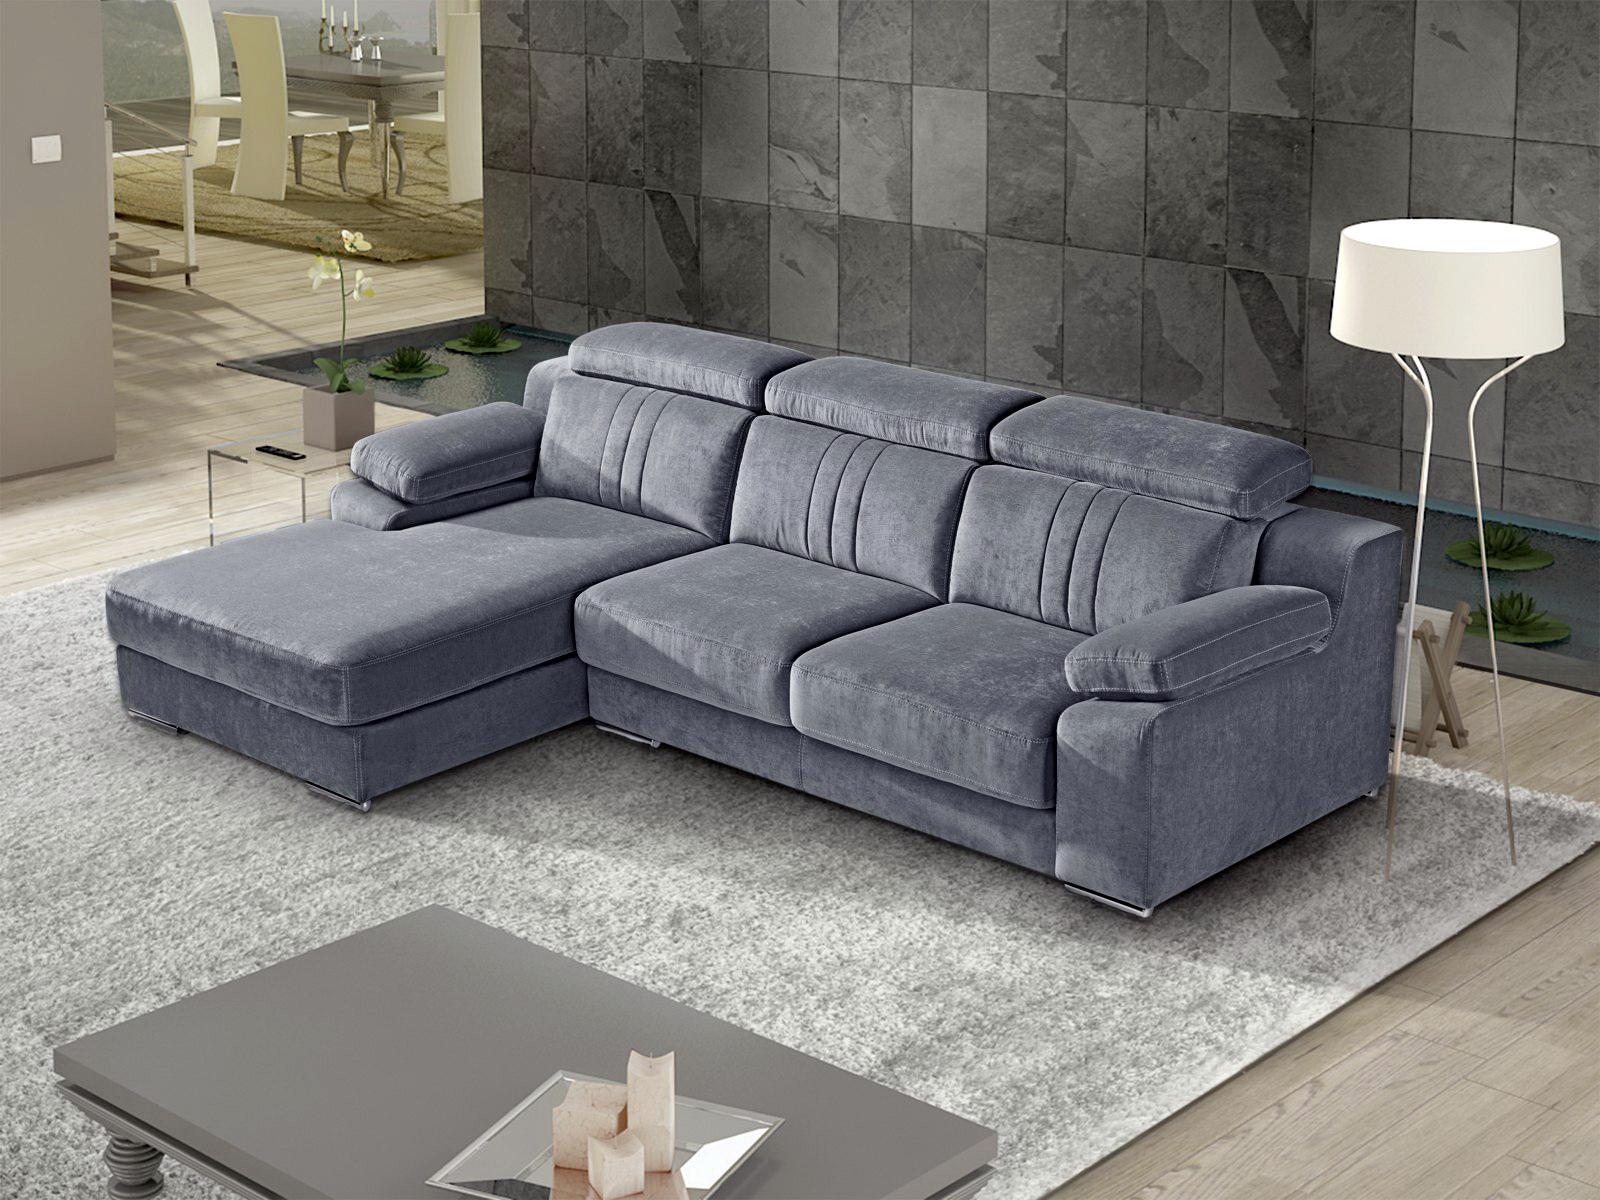 Elysee sof modular asientos fijos by grupo cj muebles for Muebles en leon baratos